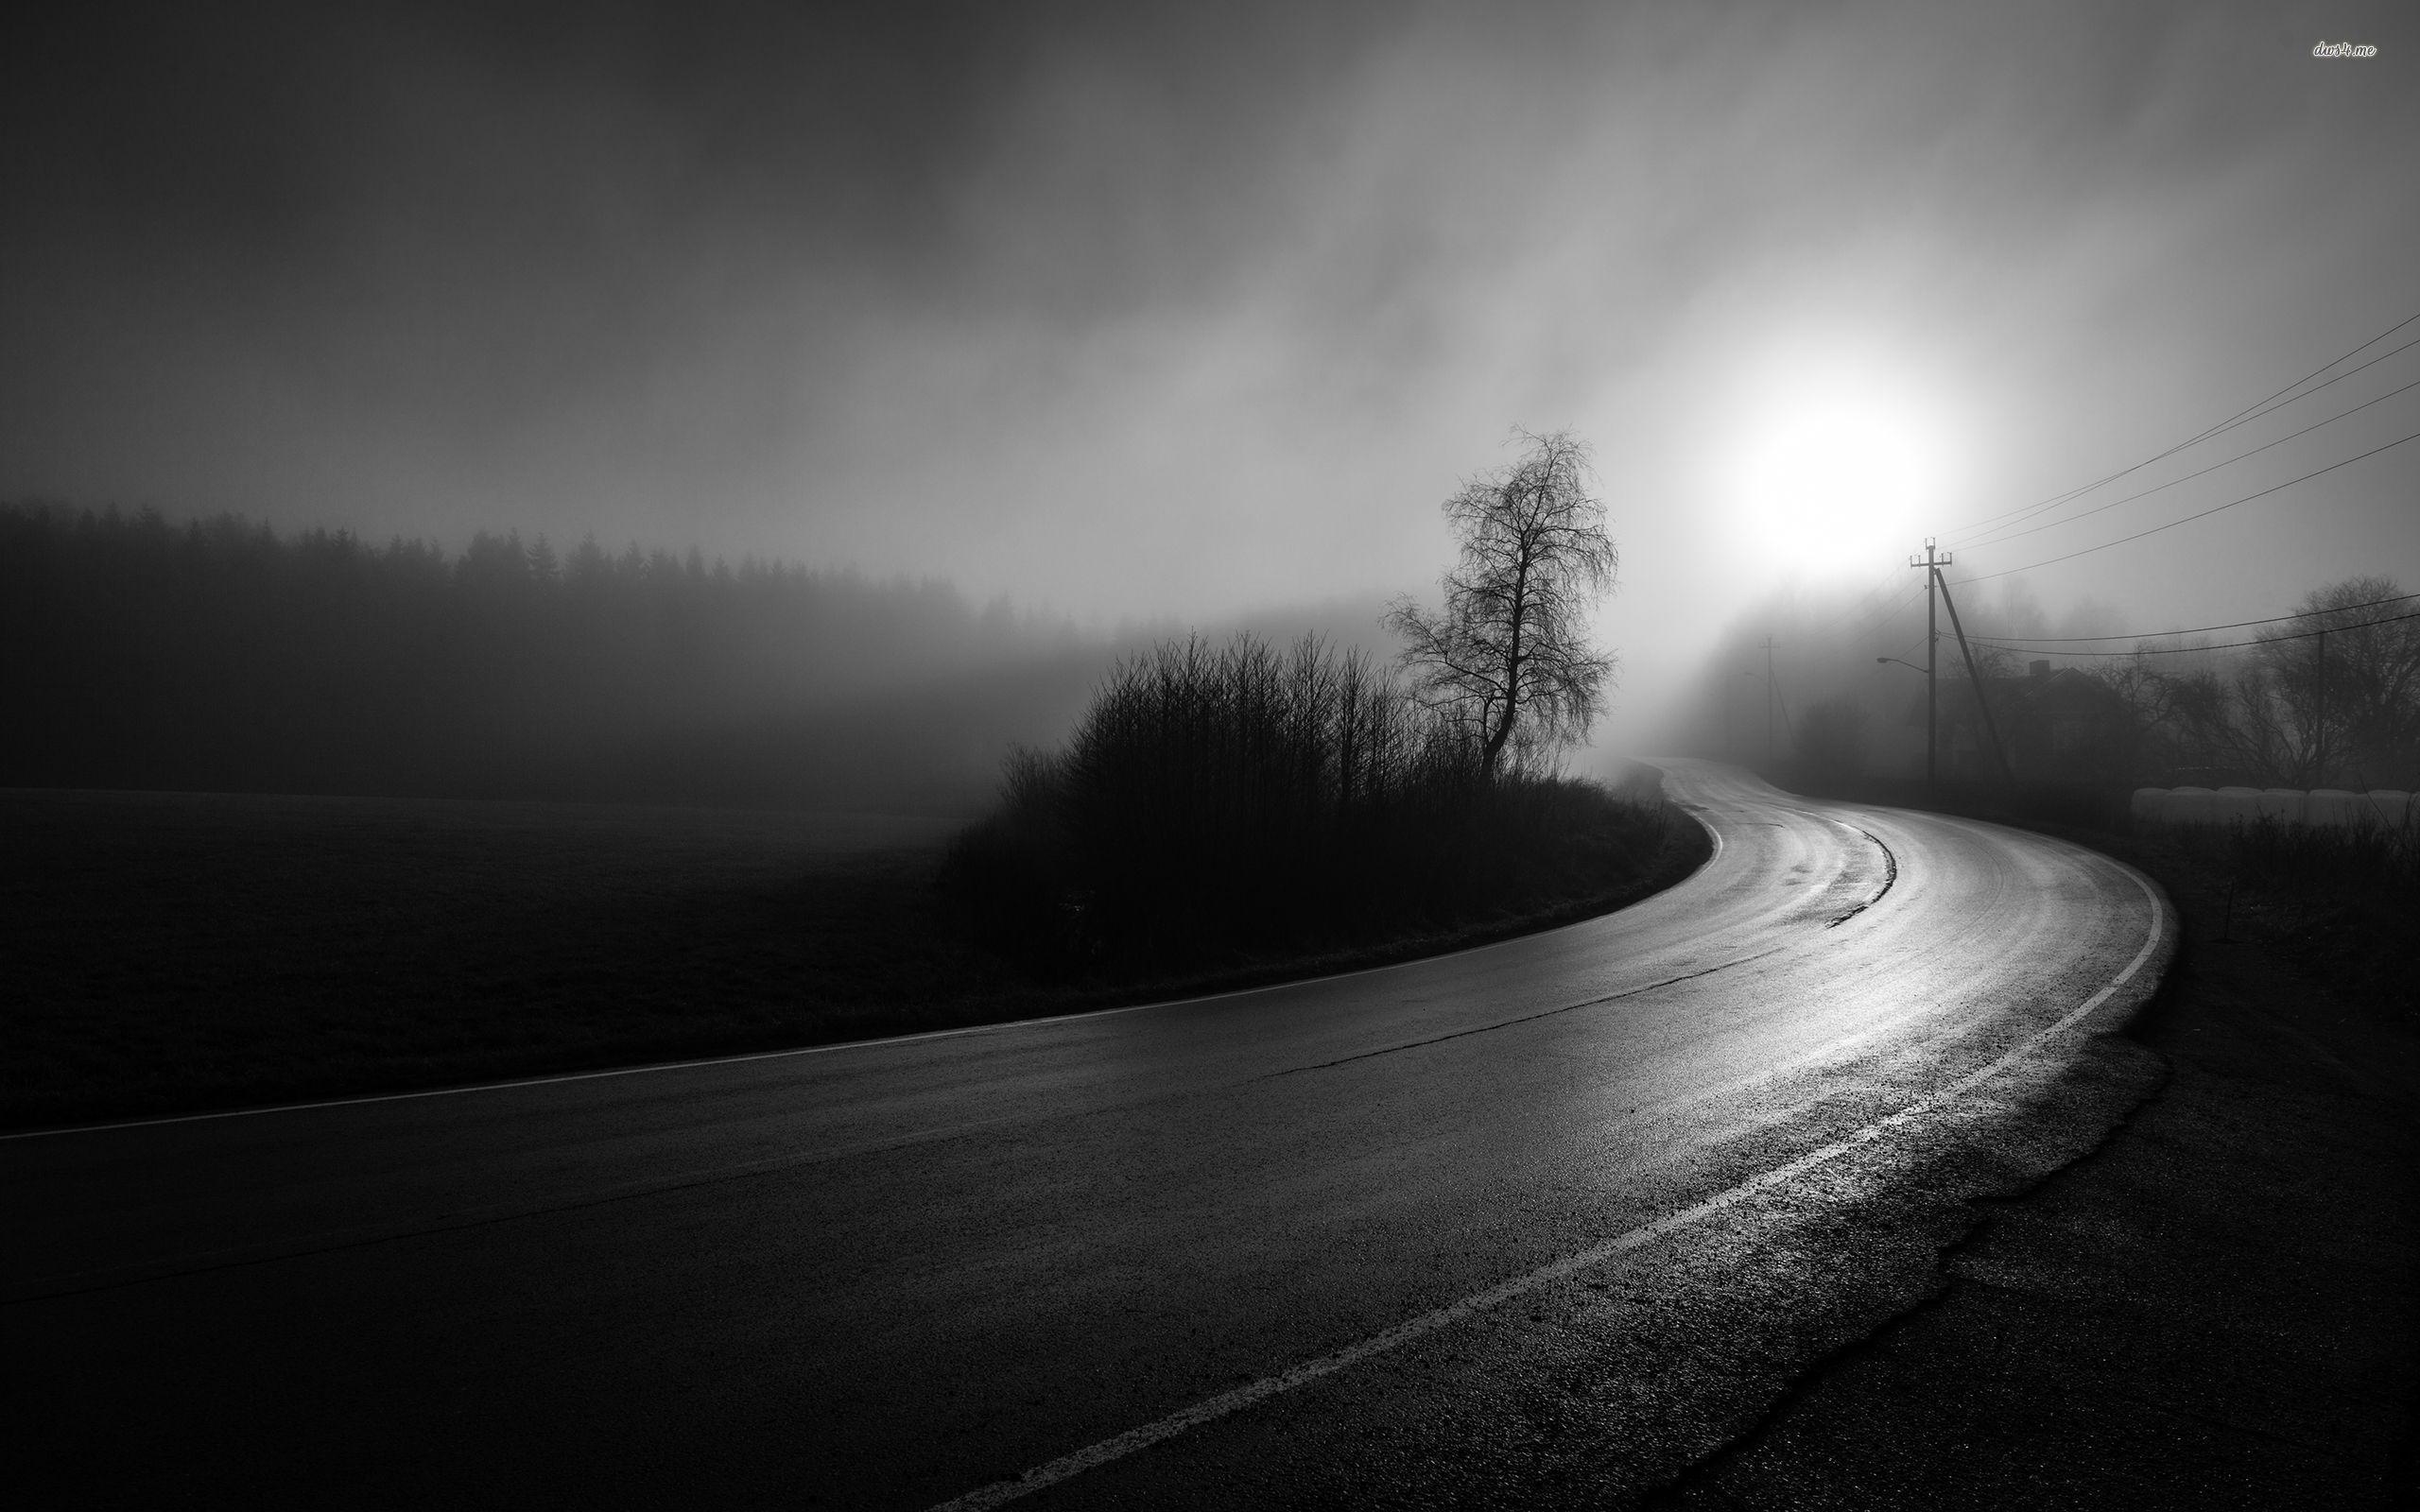 Roads Are Empty Quotes